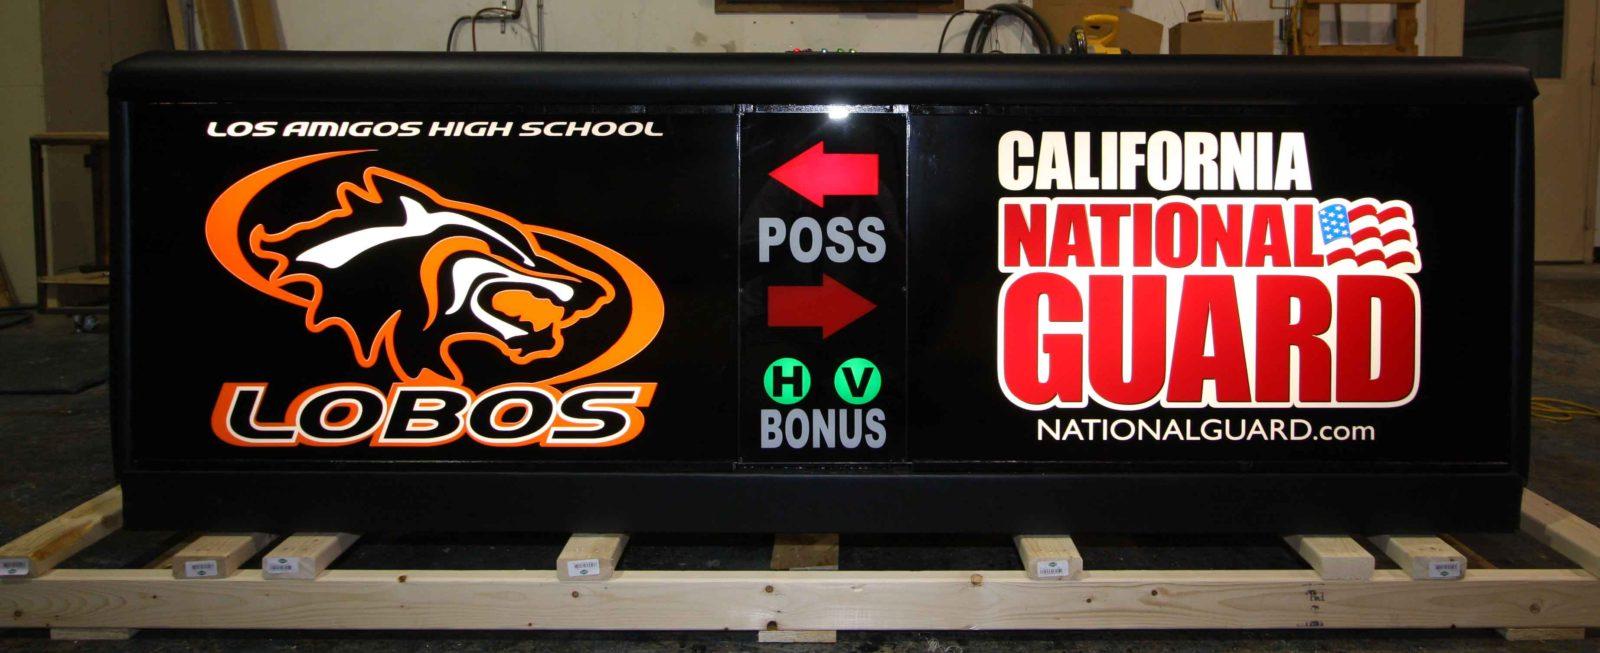 California National Guard Scoring Table